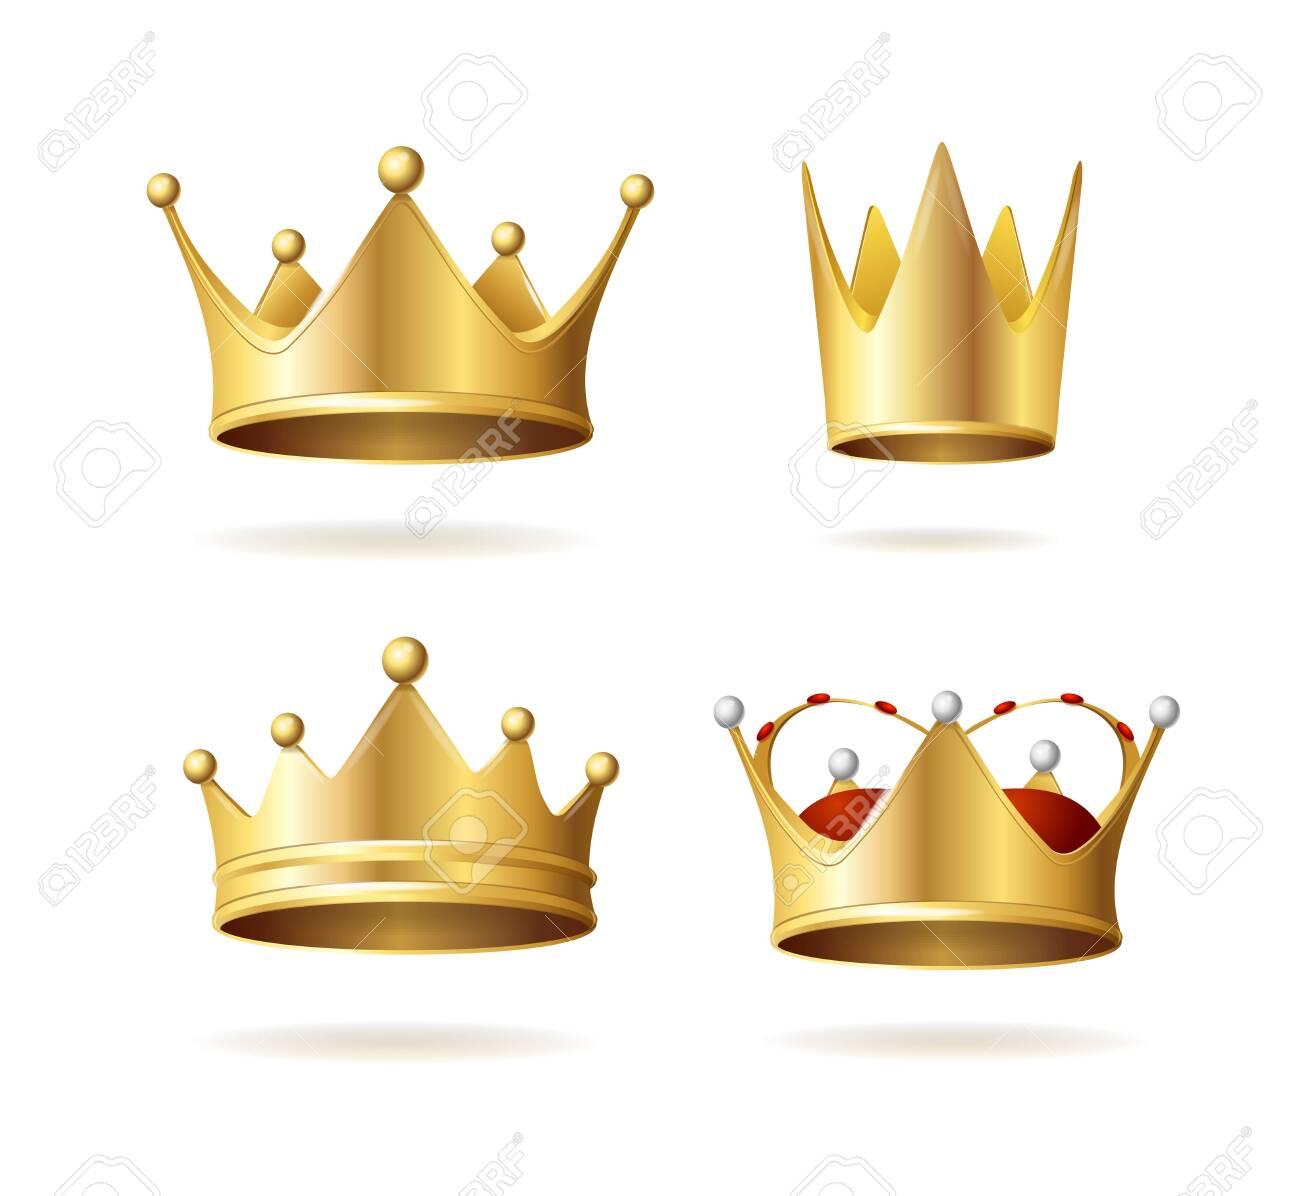 Realistic Detailed 3d Golden Royal Crown Set. Vector - 152935472